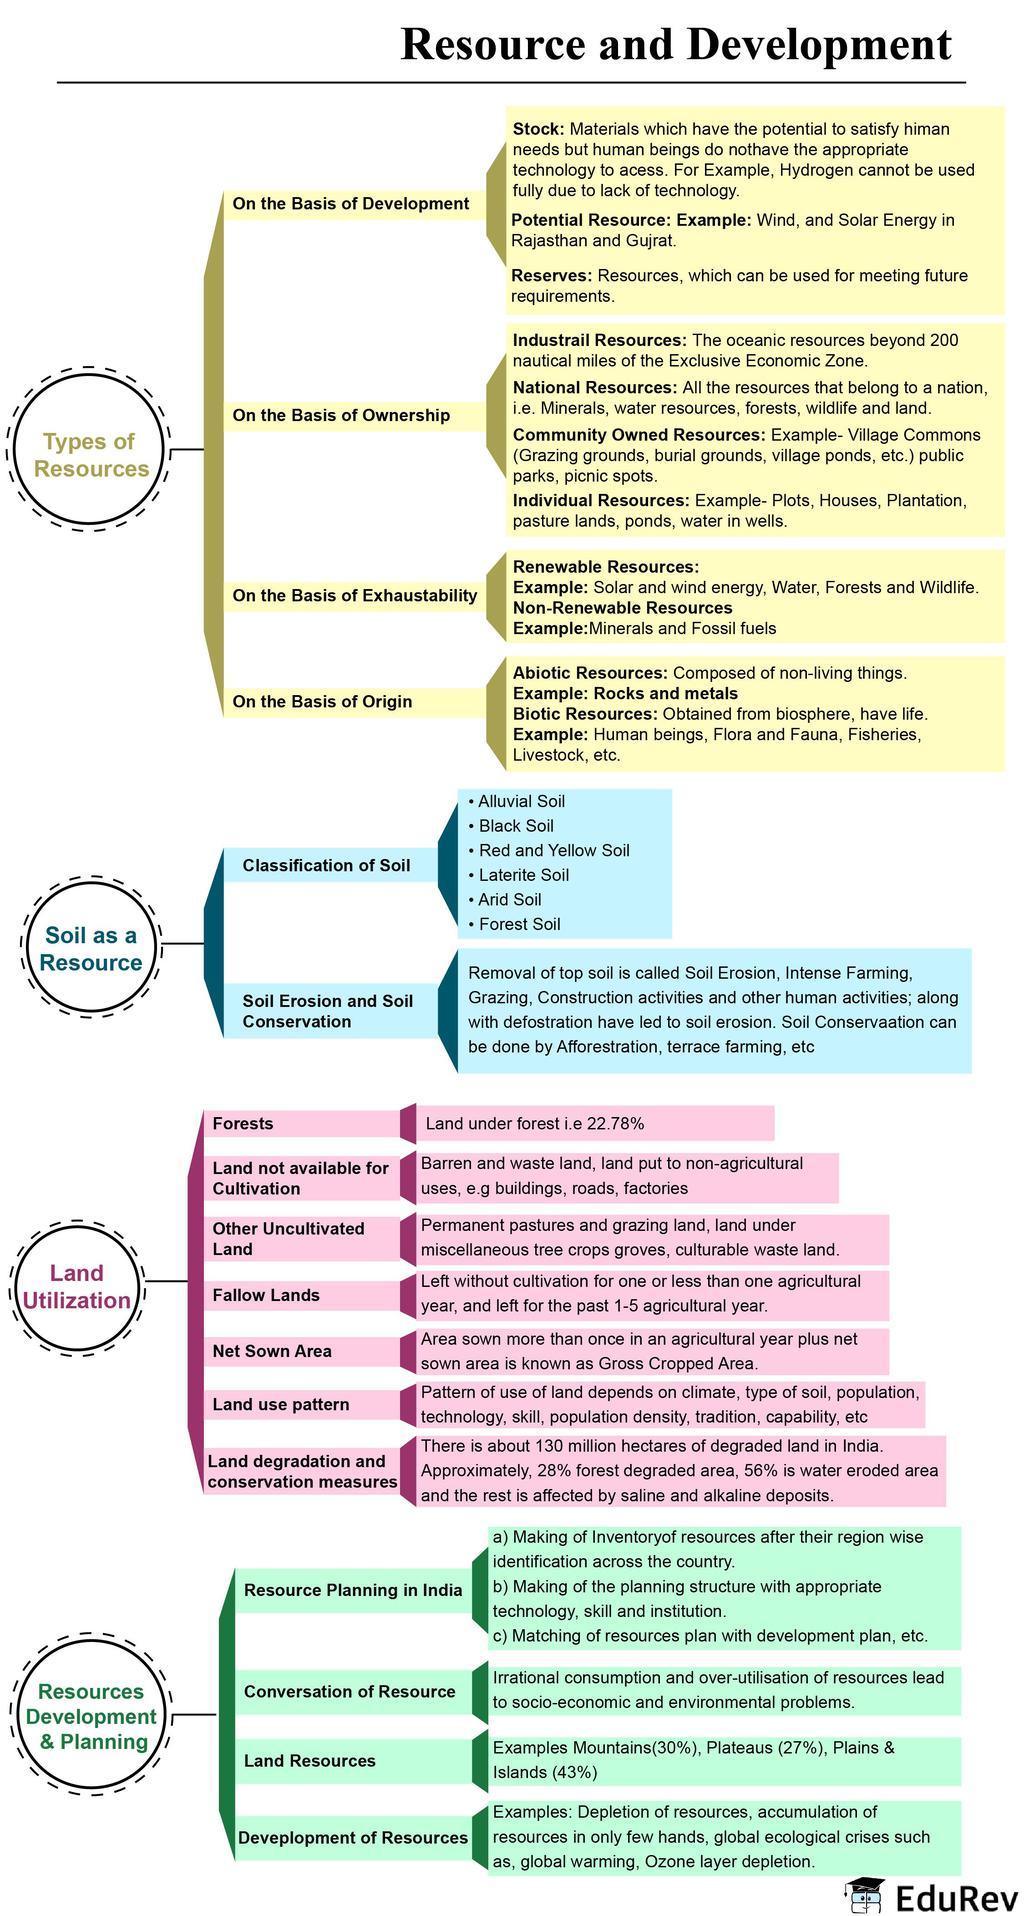 NCERT Gist: Resources and Development Notes | EduRev